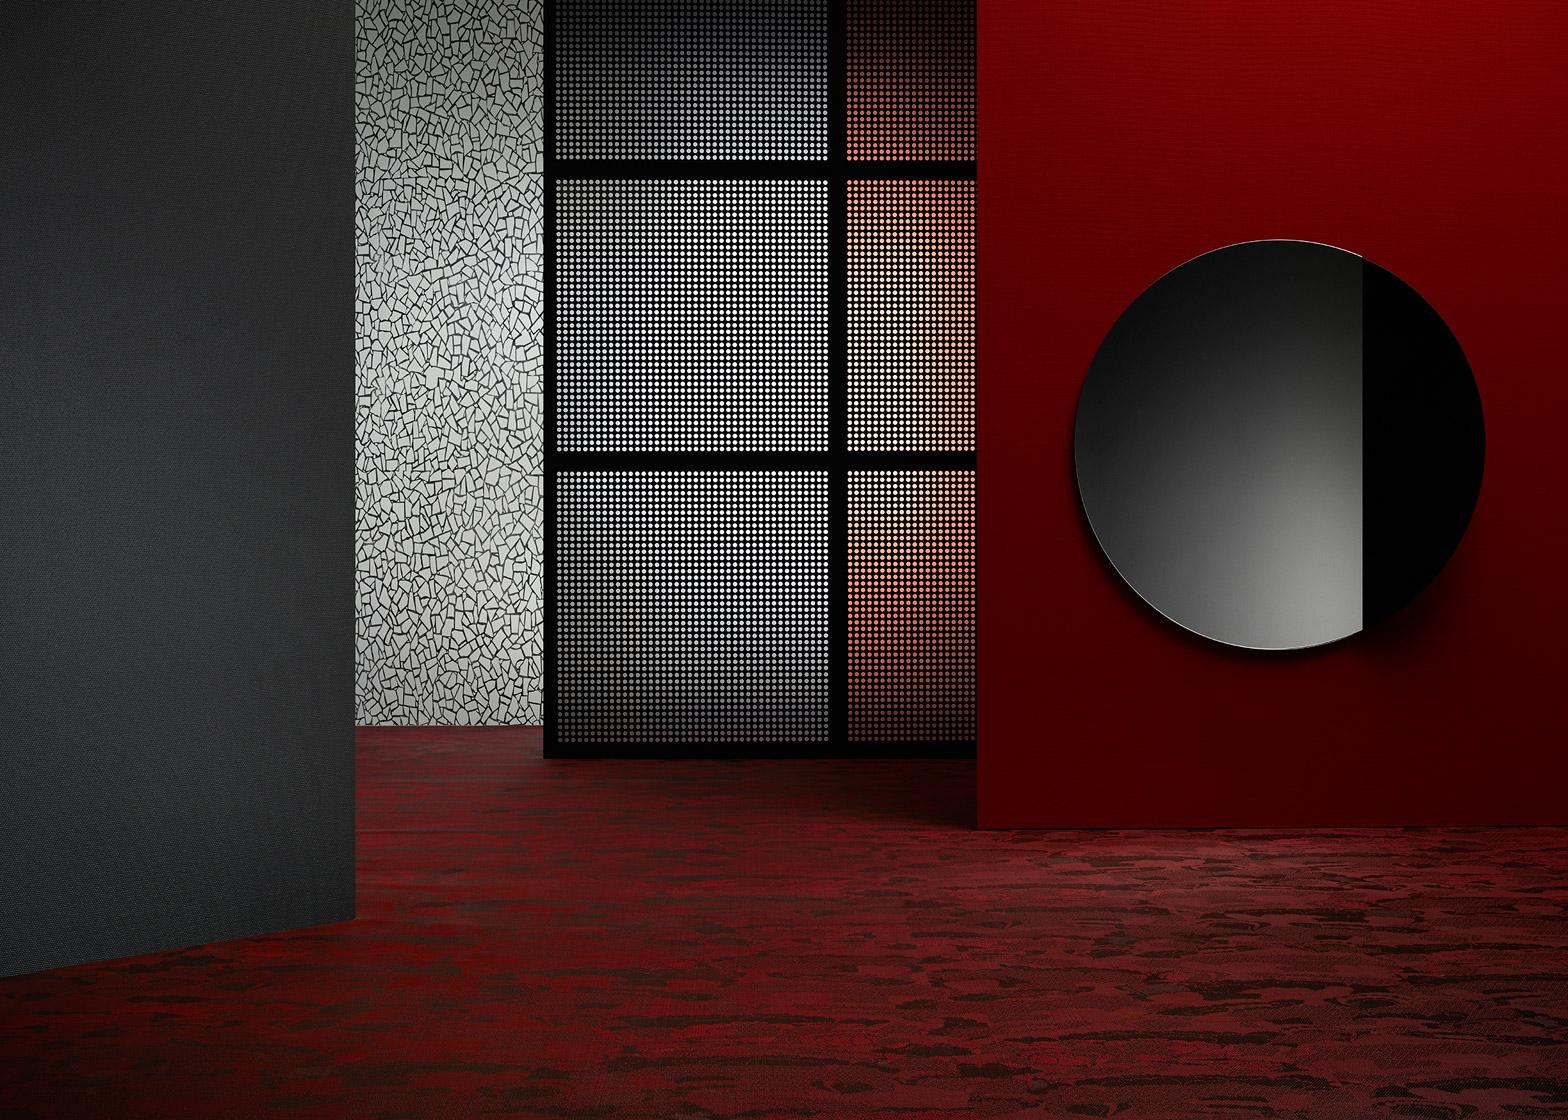 Doshi Levien's visual campaign for Swedish flooring brand Bolon